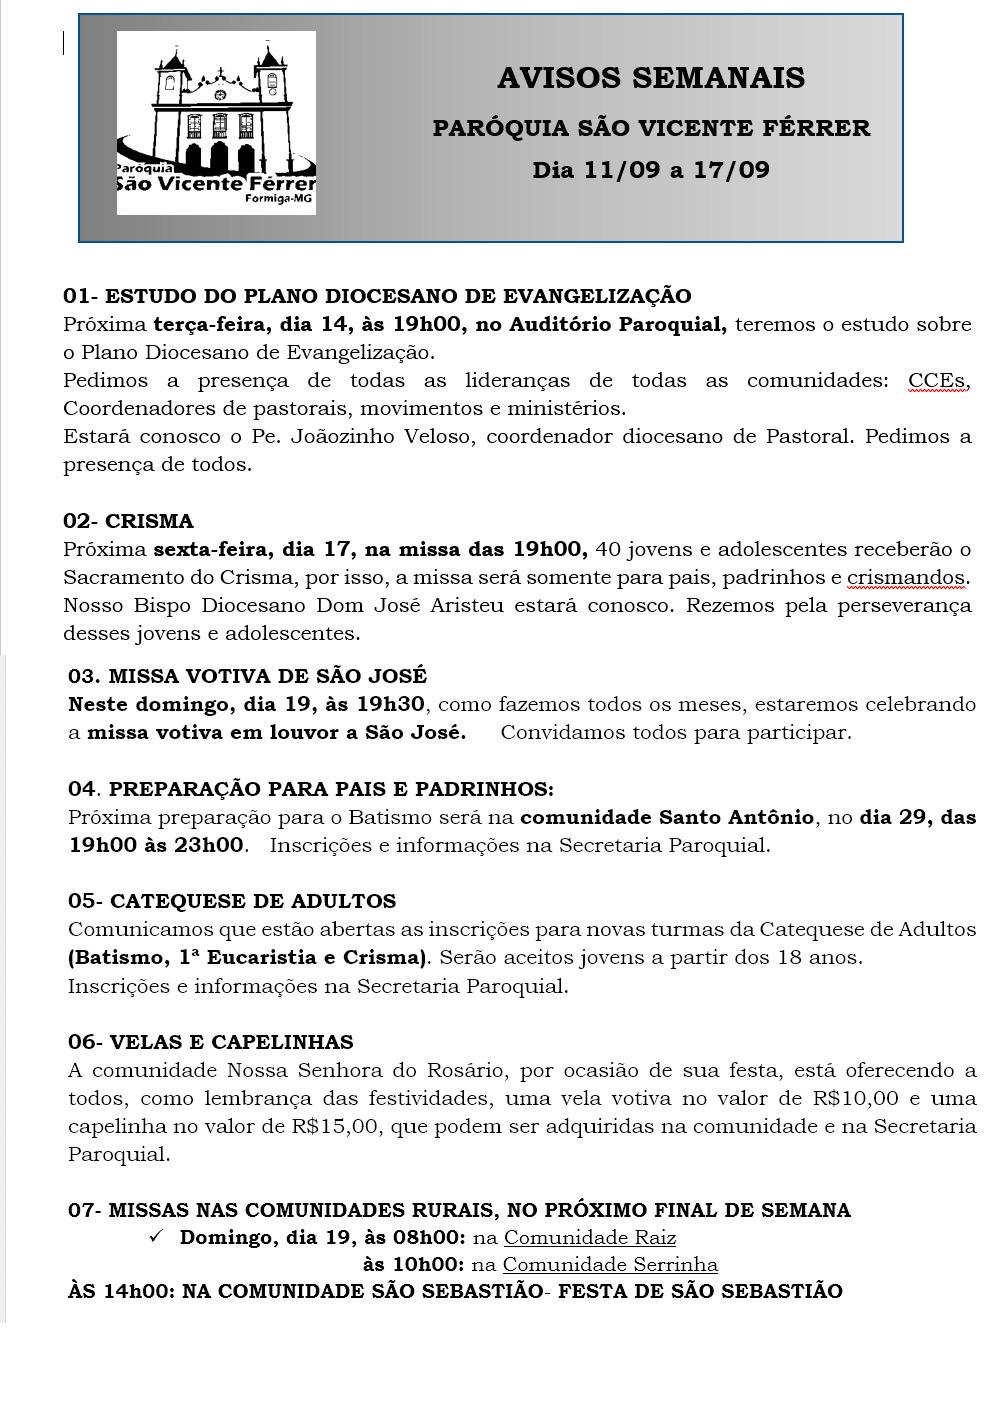 avisos-11a17